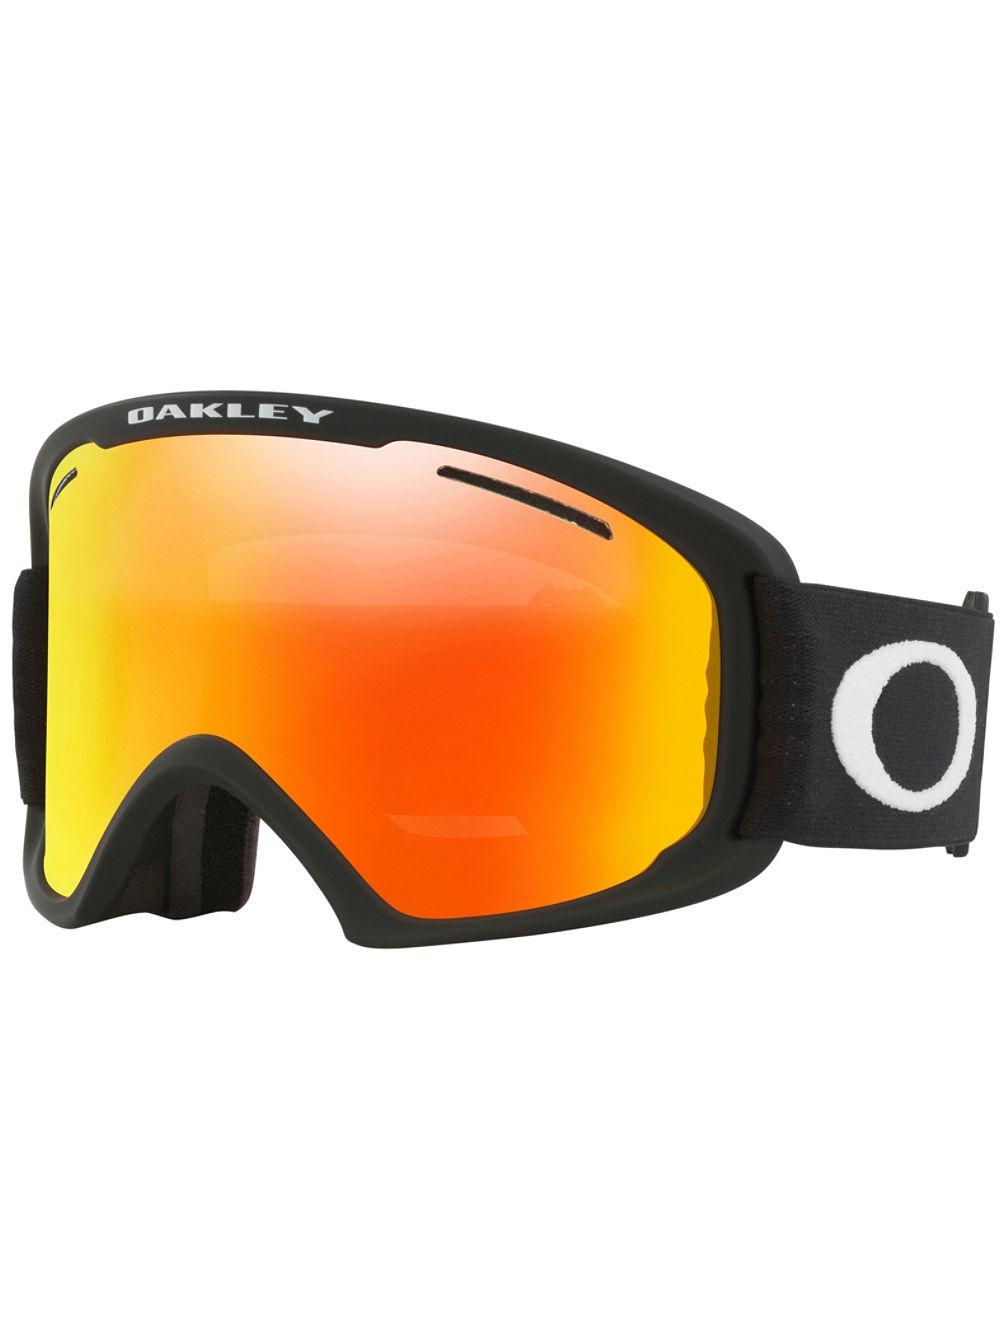 Oakley O Frame 2.0 XL Matte Black Goggle online kaufen bei blue ...